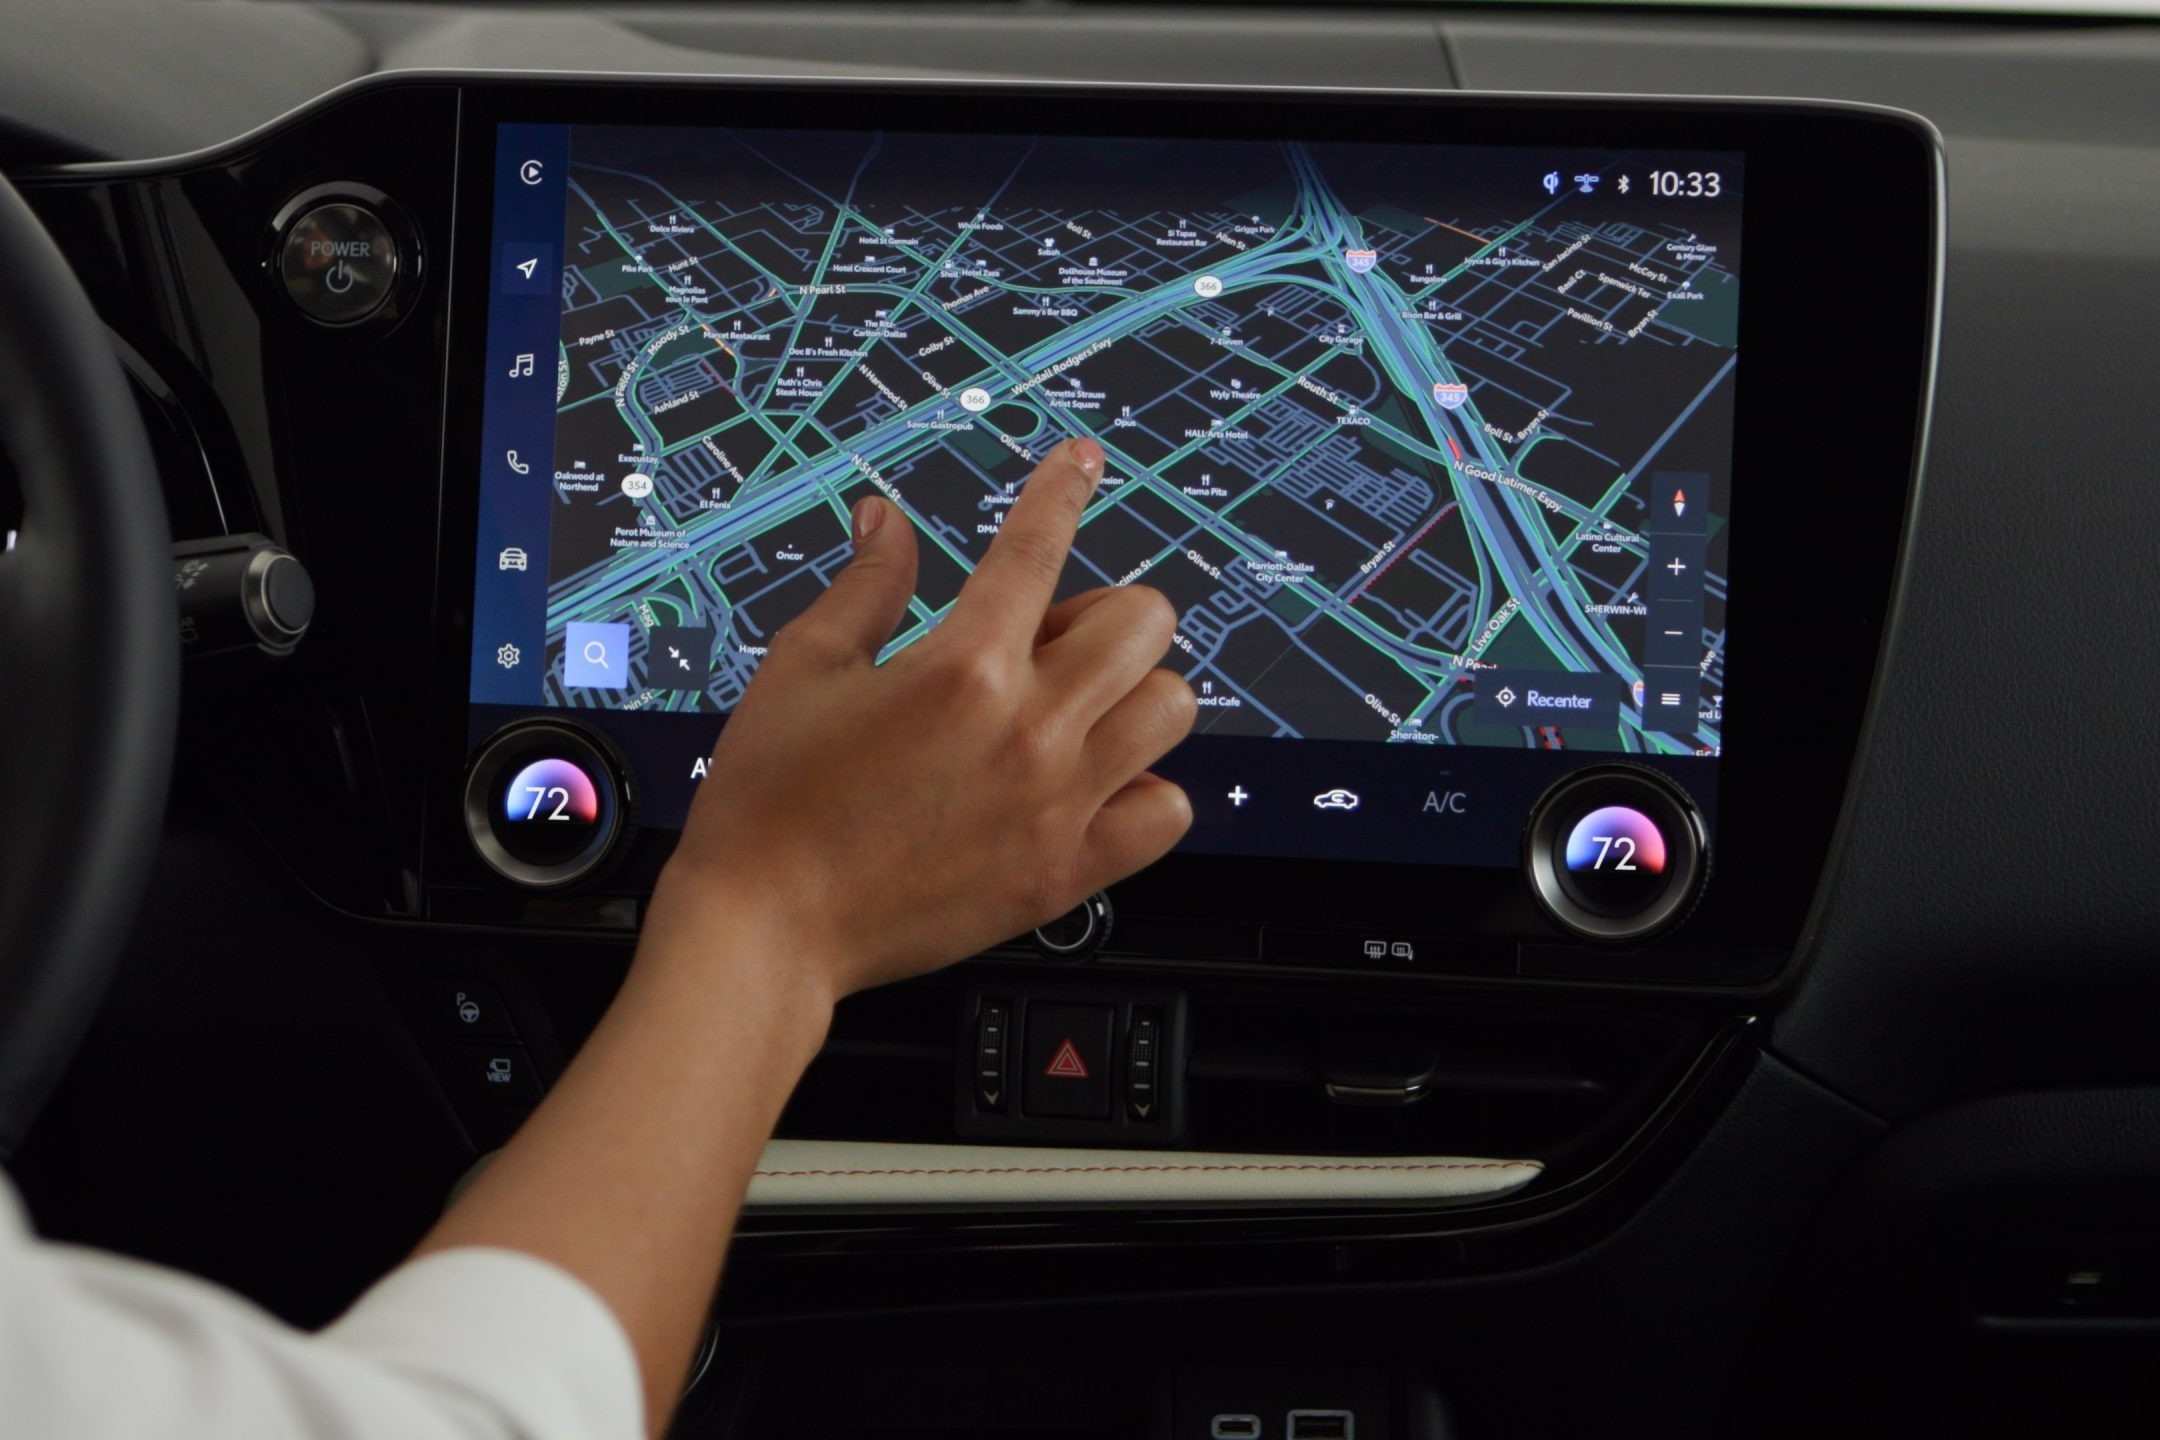 2022 Lexus NX Infotainment System